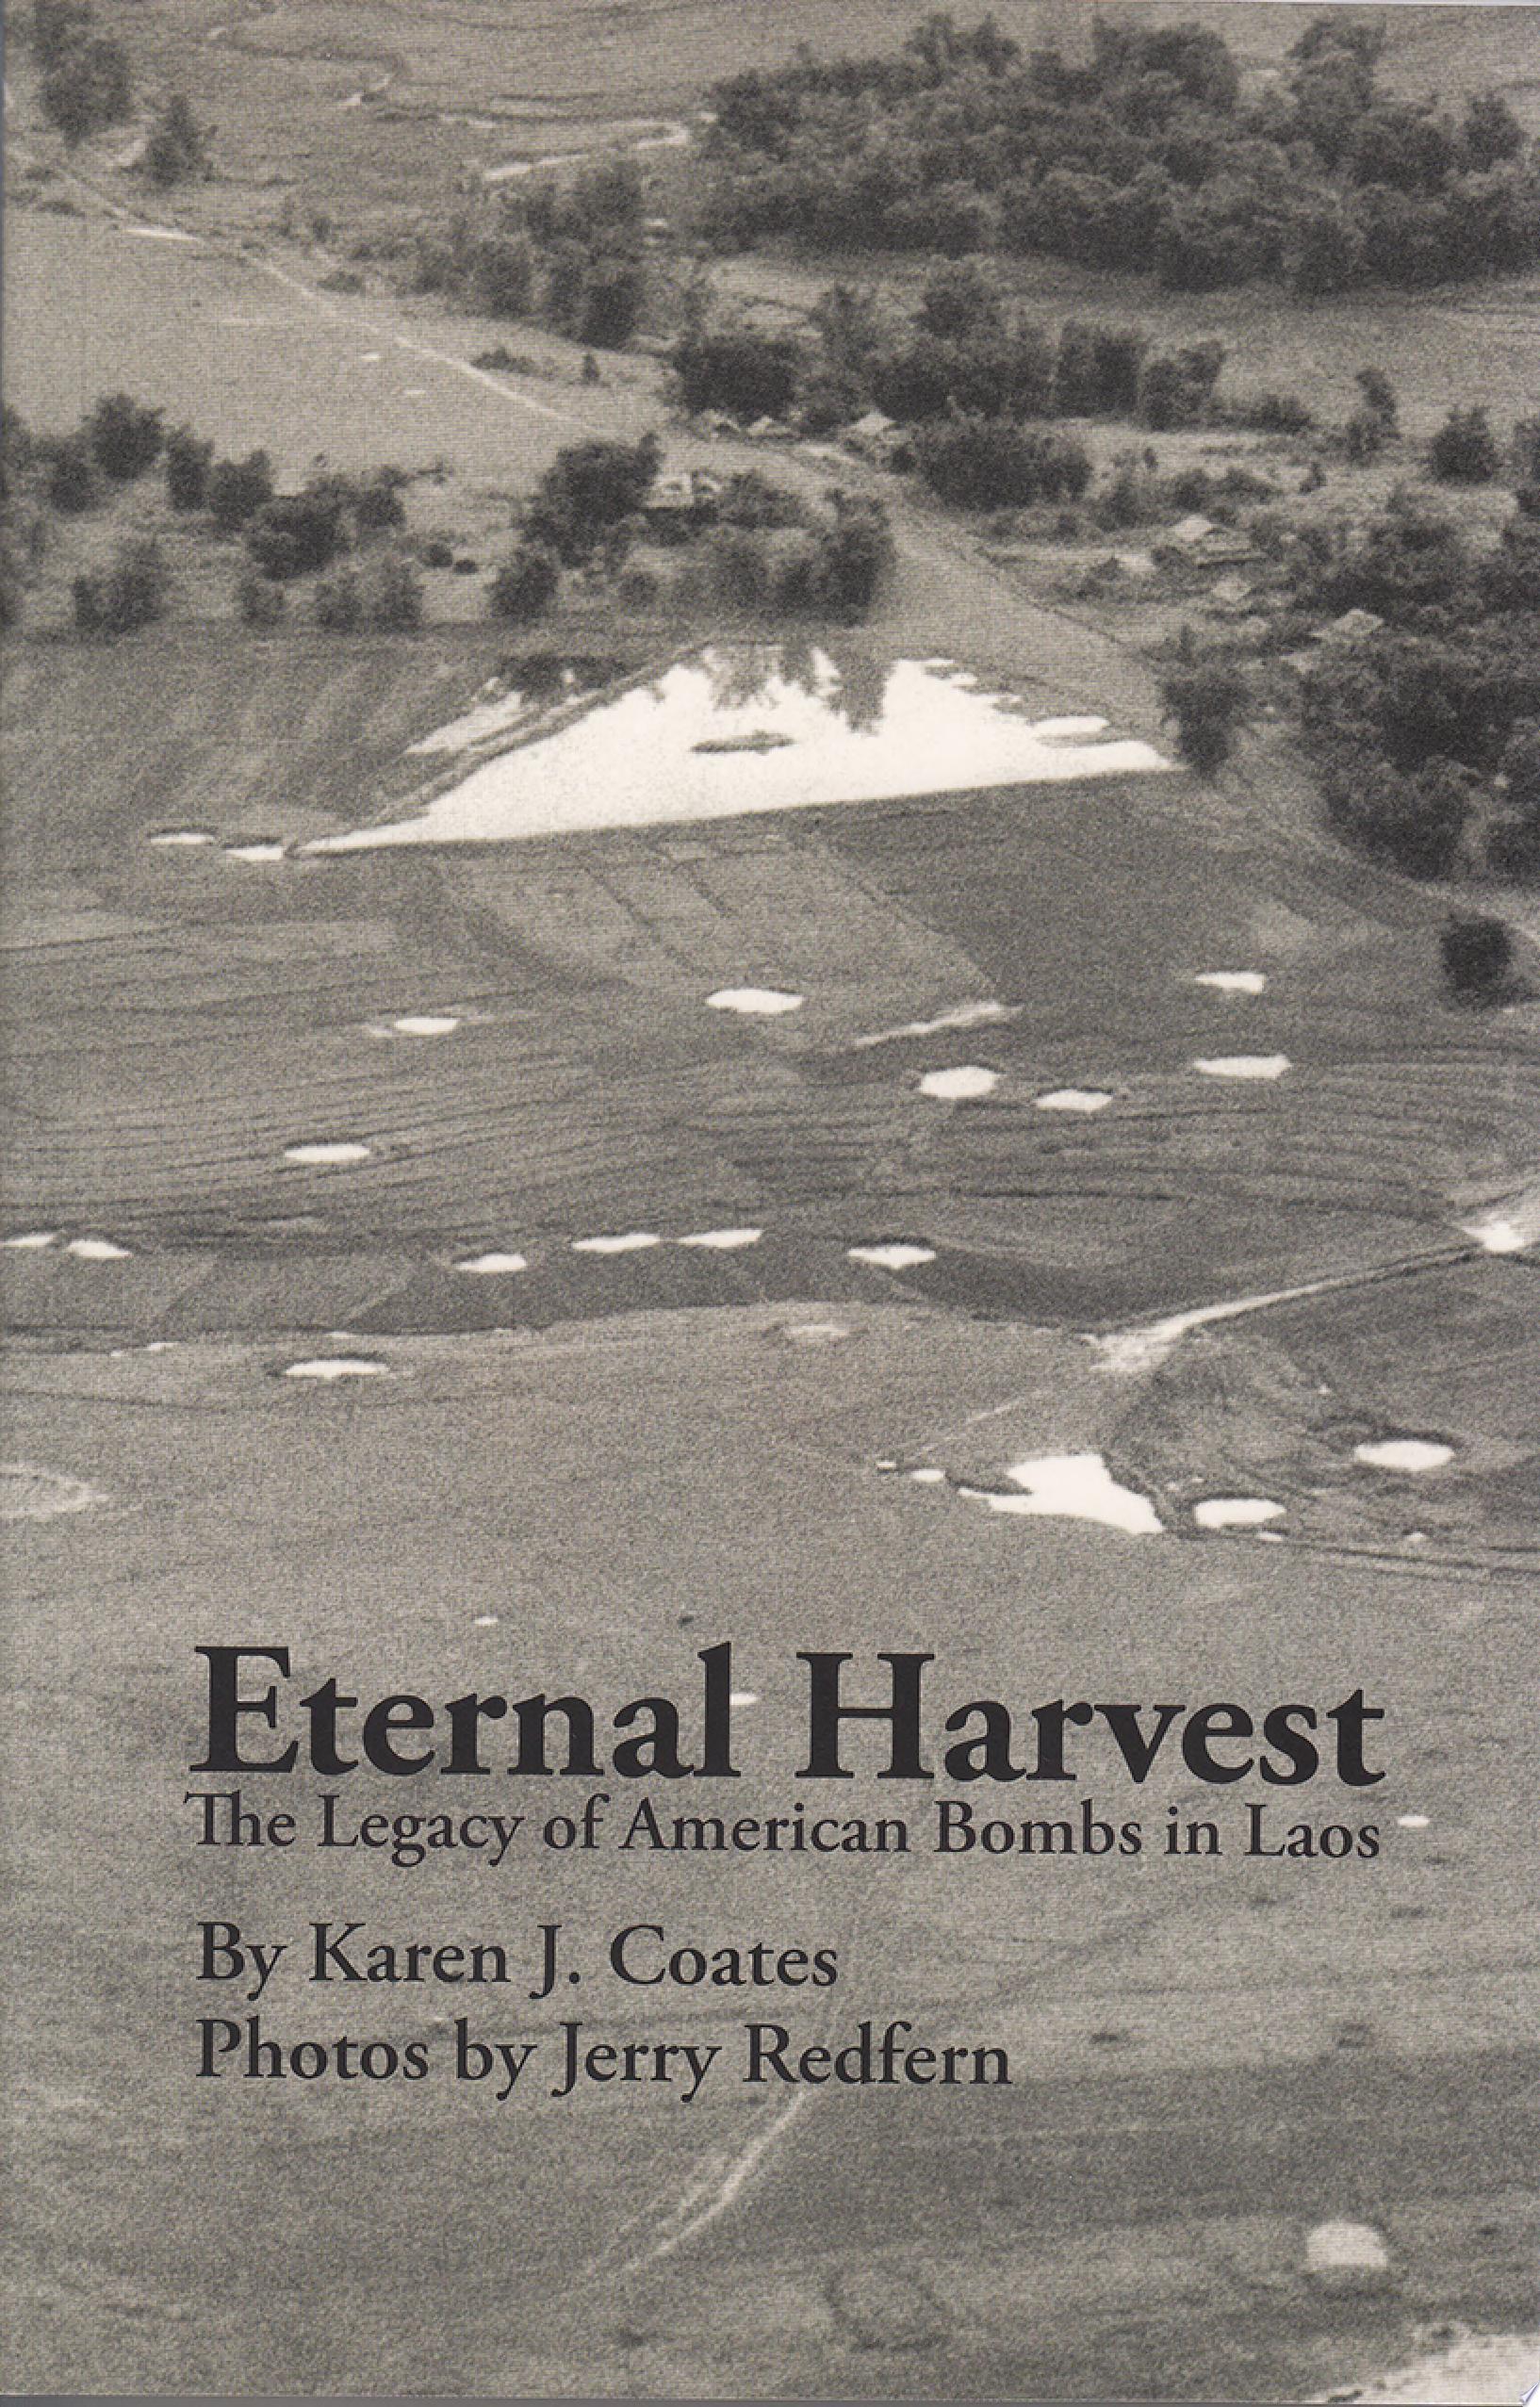 Eternal Harvest